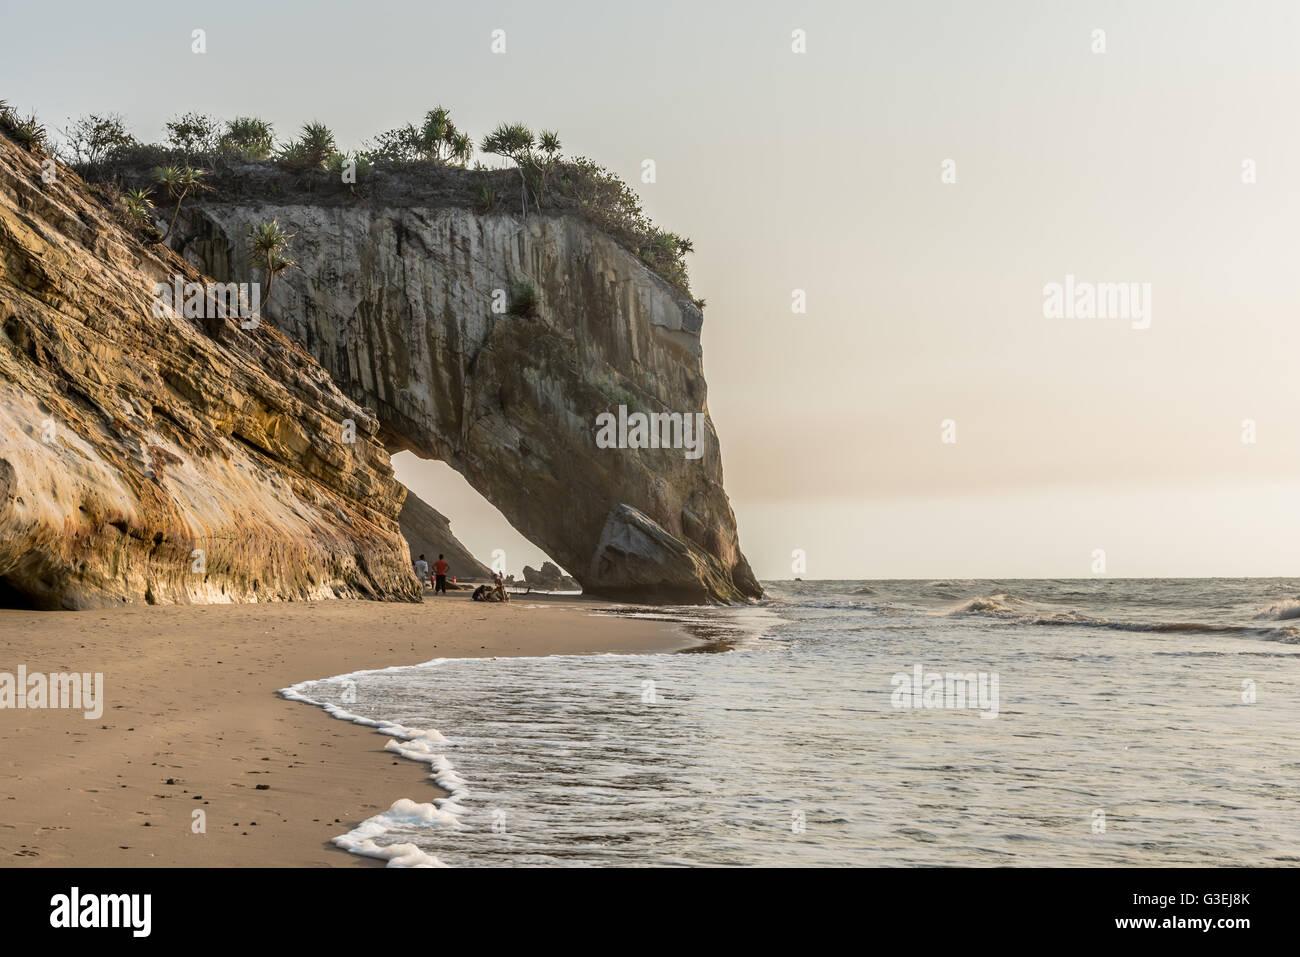 Tusan Cliff, rock formation on the Tusan Beach in Miri during sunset. - Stock Image